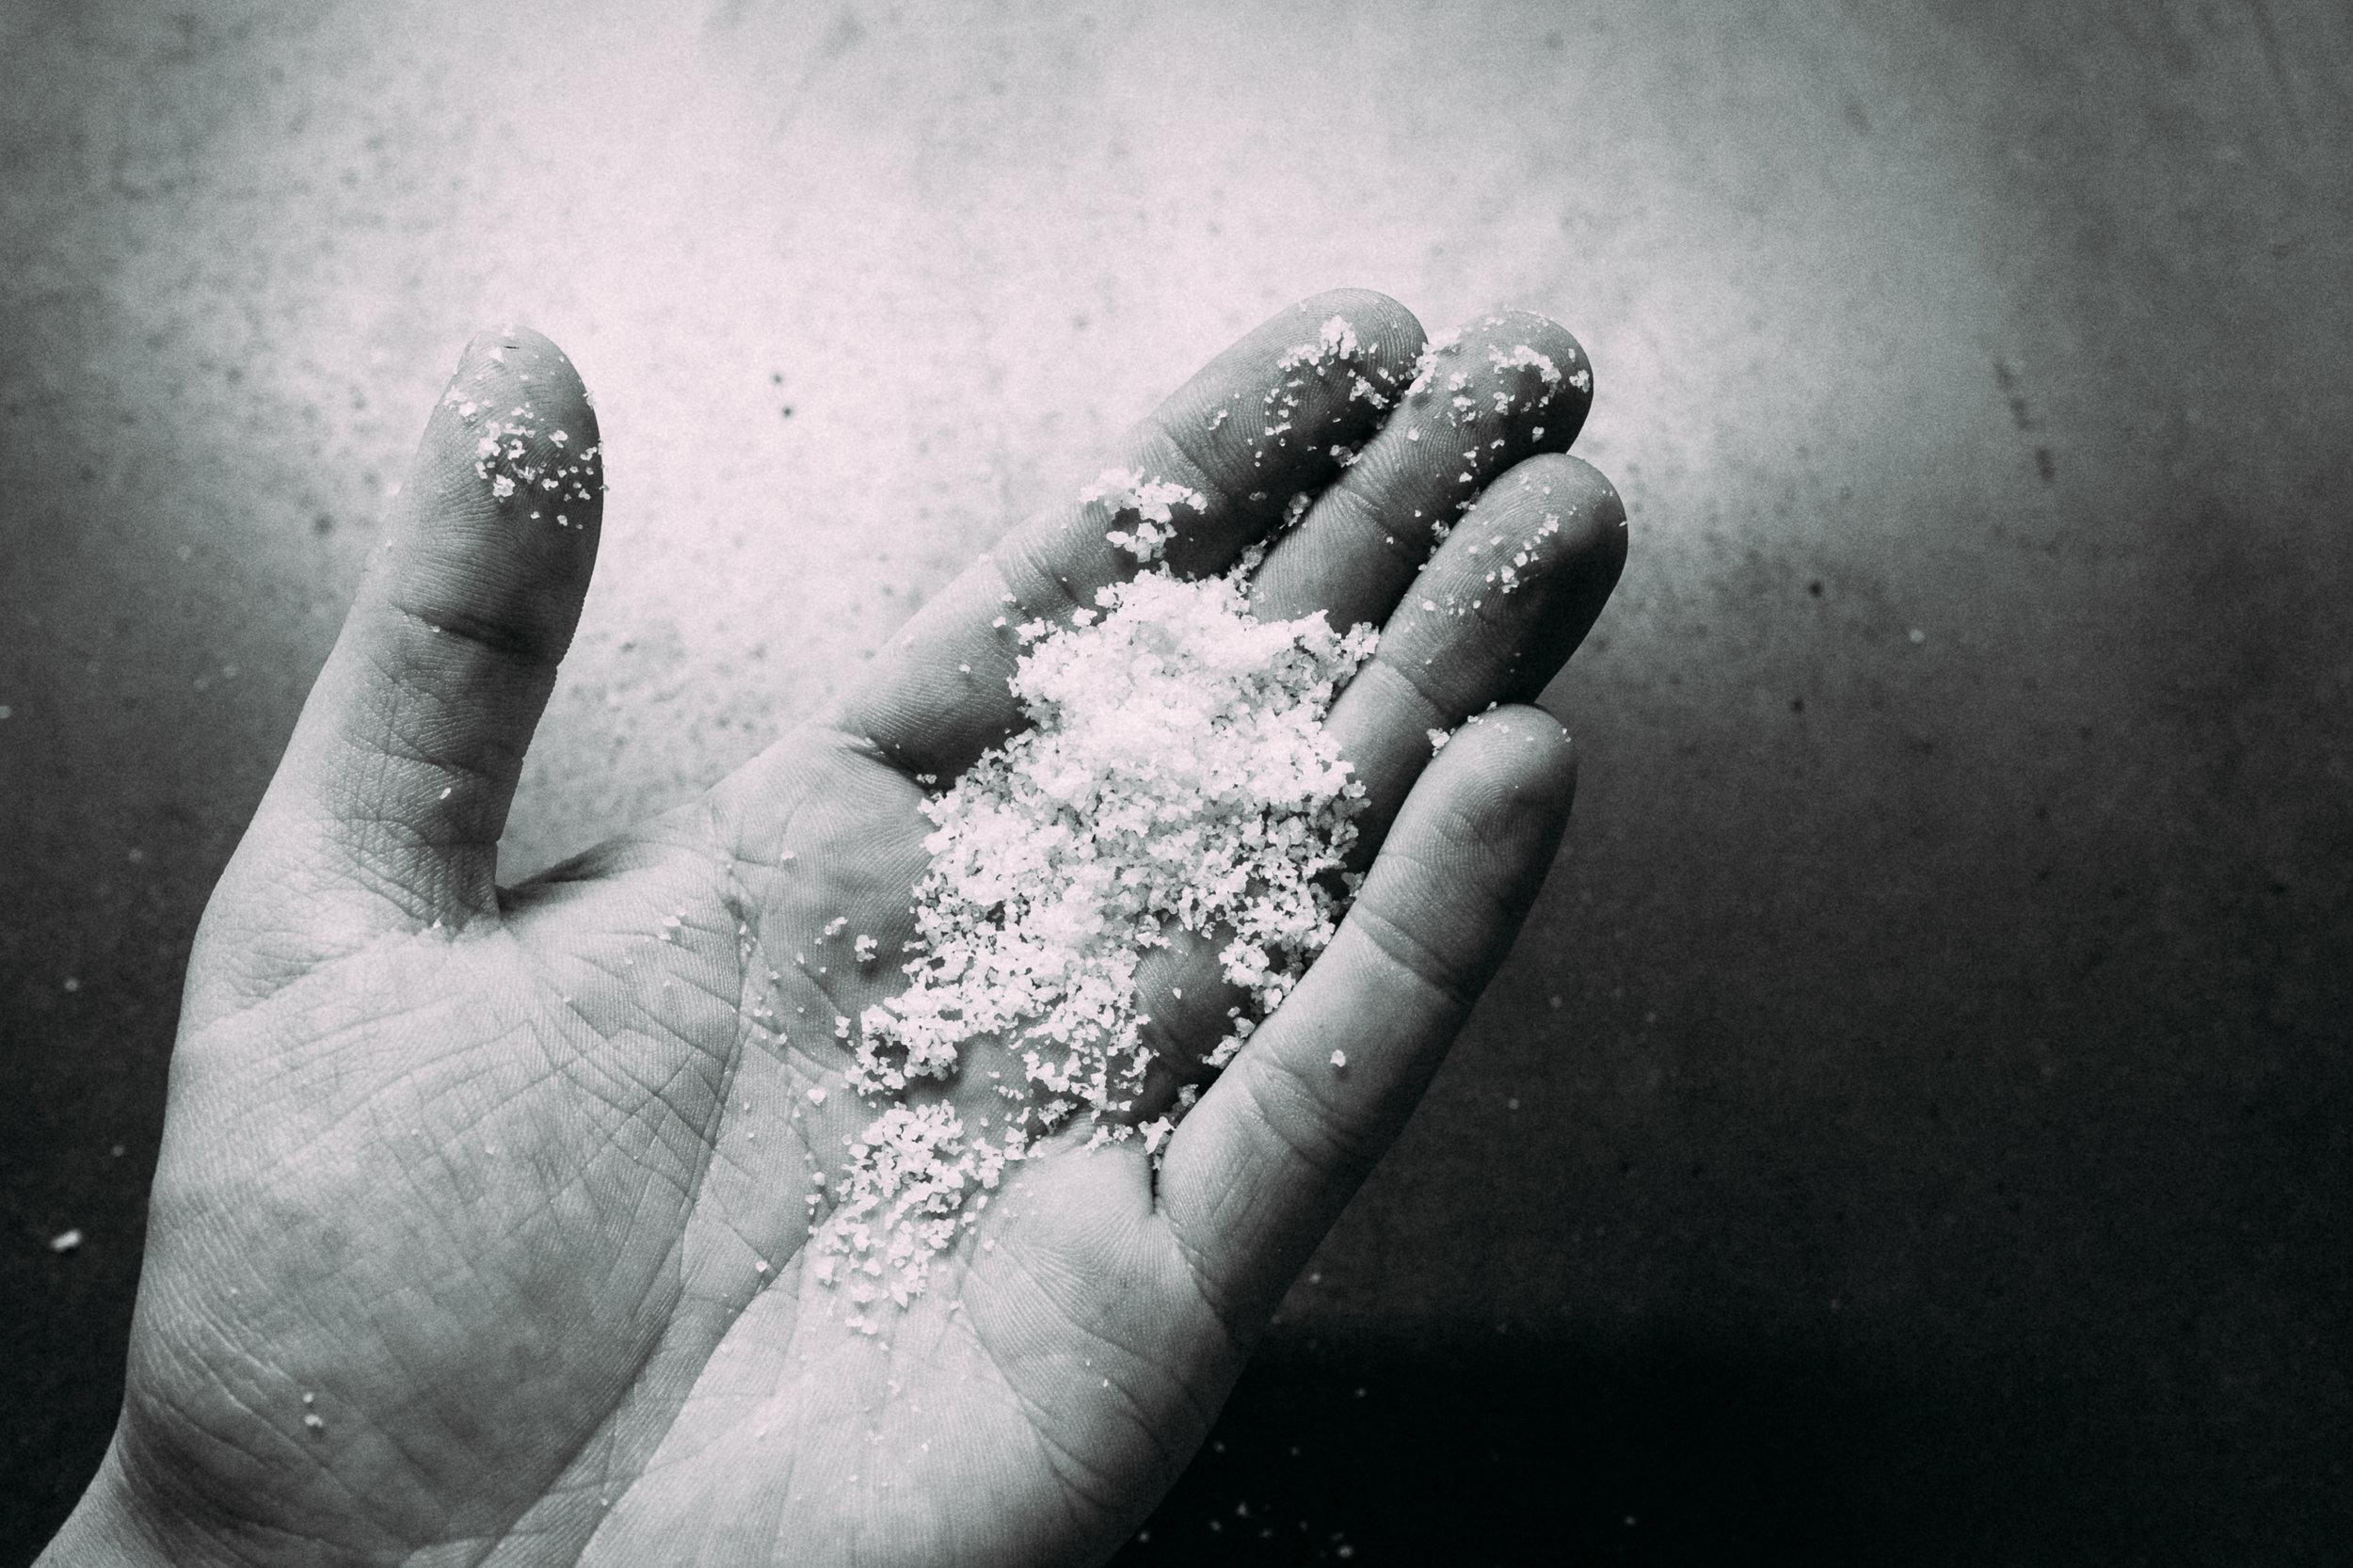 arot_salt-1-3.jpg